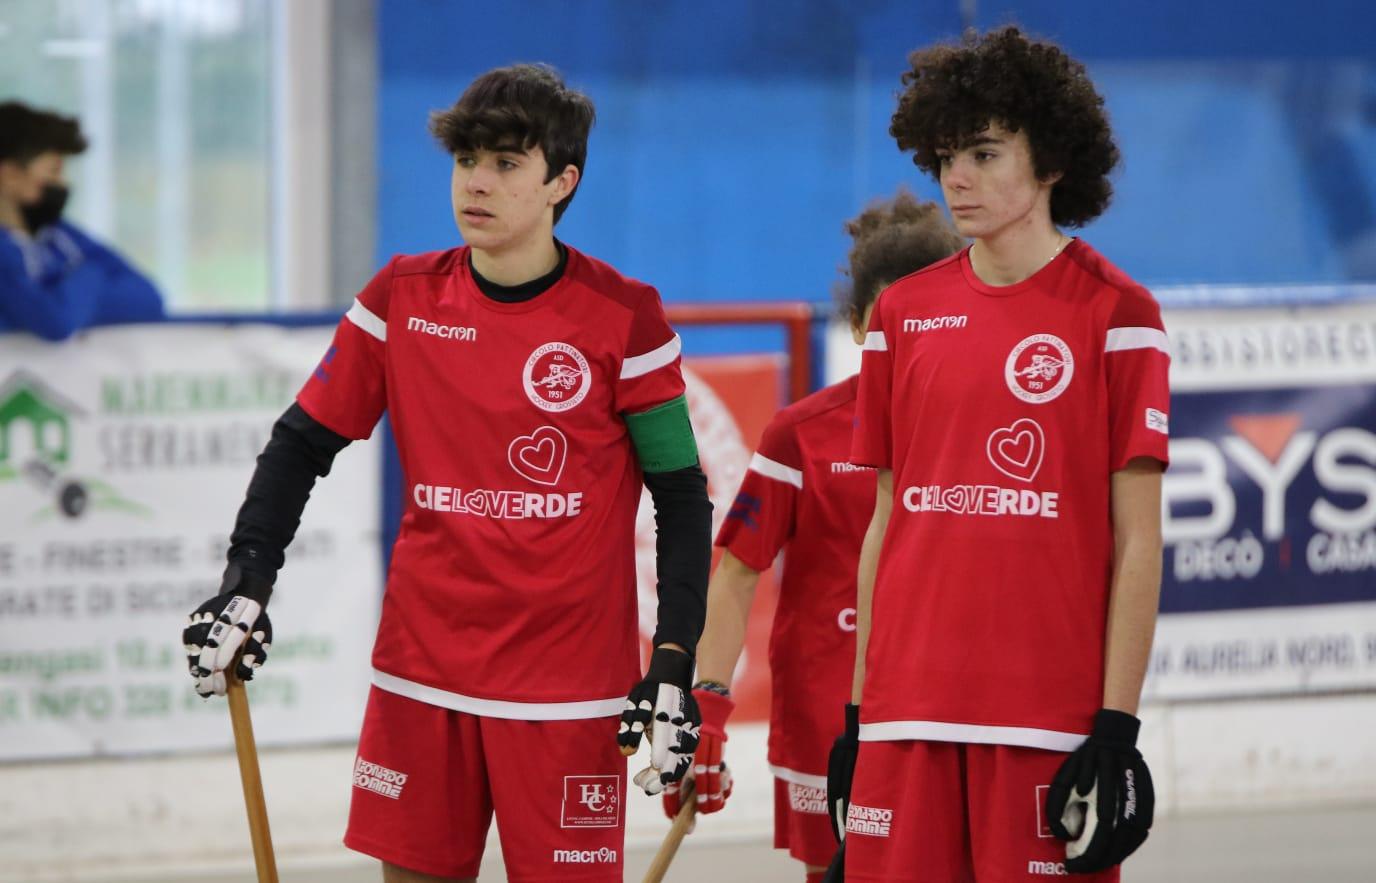 hockey-pista-circolo-pattinatori-grosseto-under-15-Grosseto-Follonica-B-Montomoli-e-Giusti